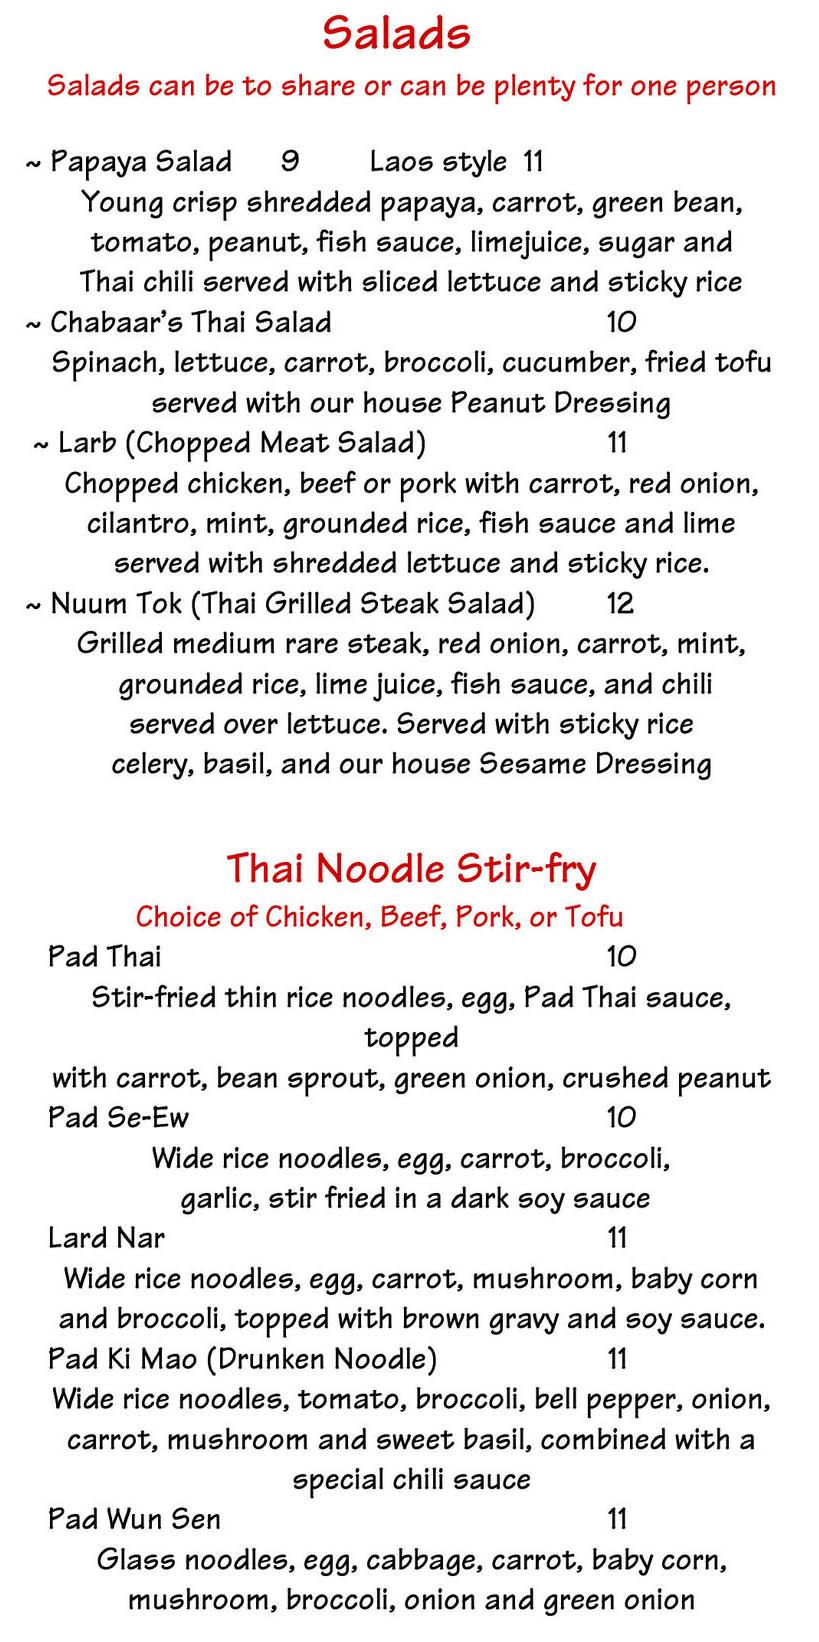 Chabaar Beyond Thai menu - salads, stir fry